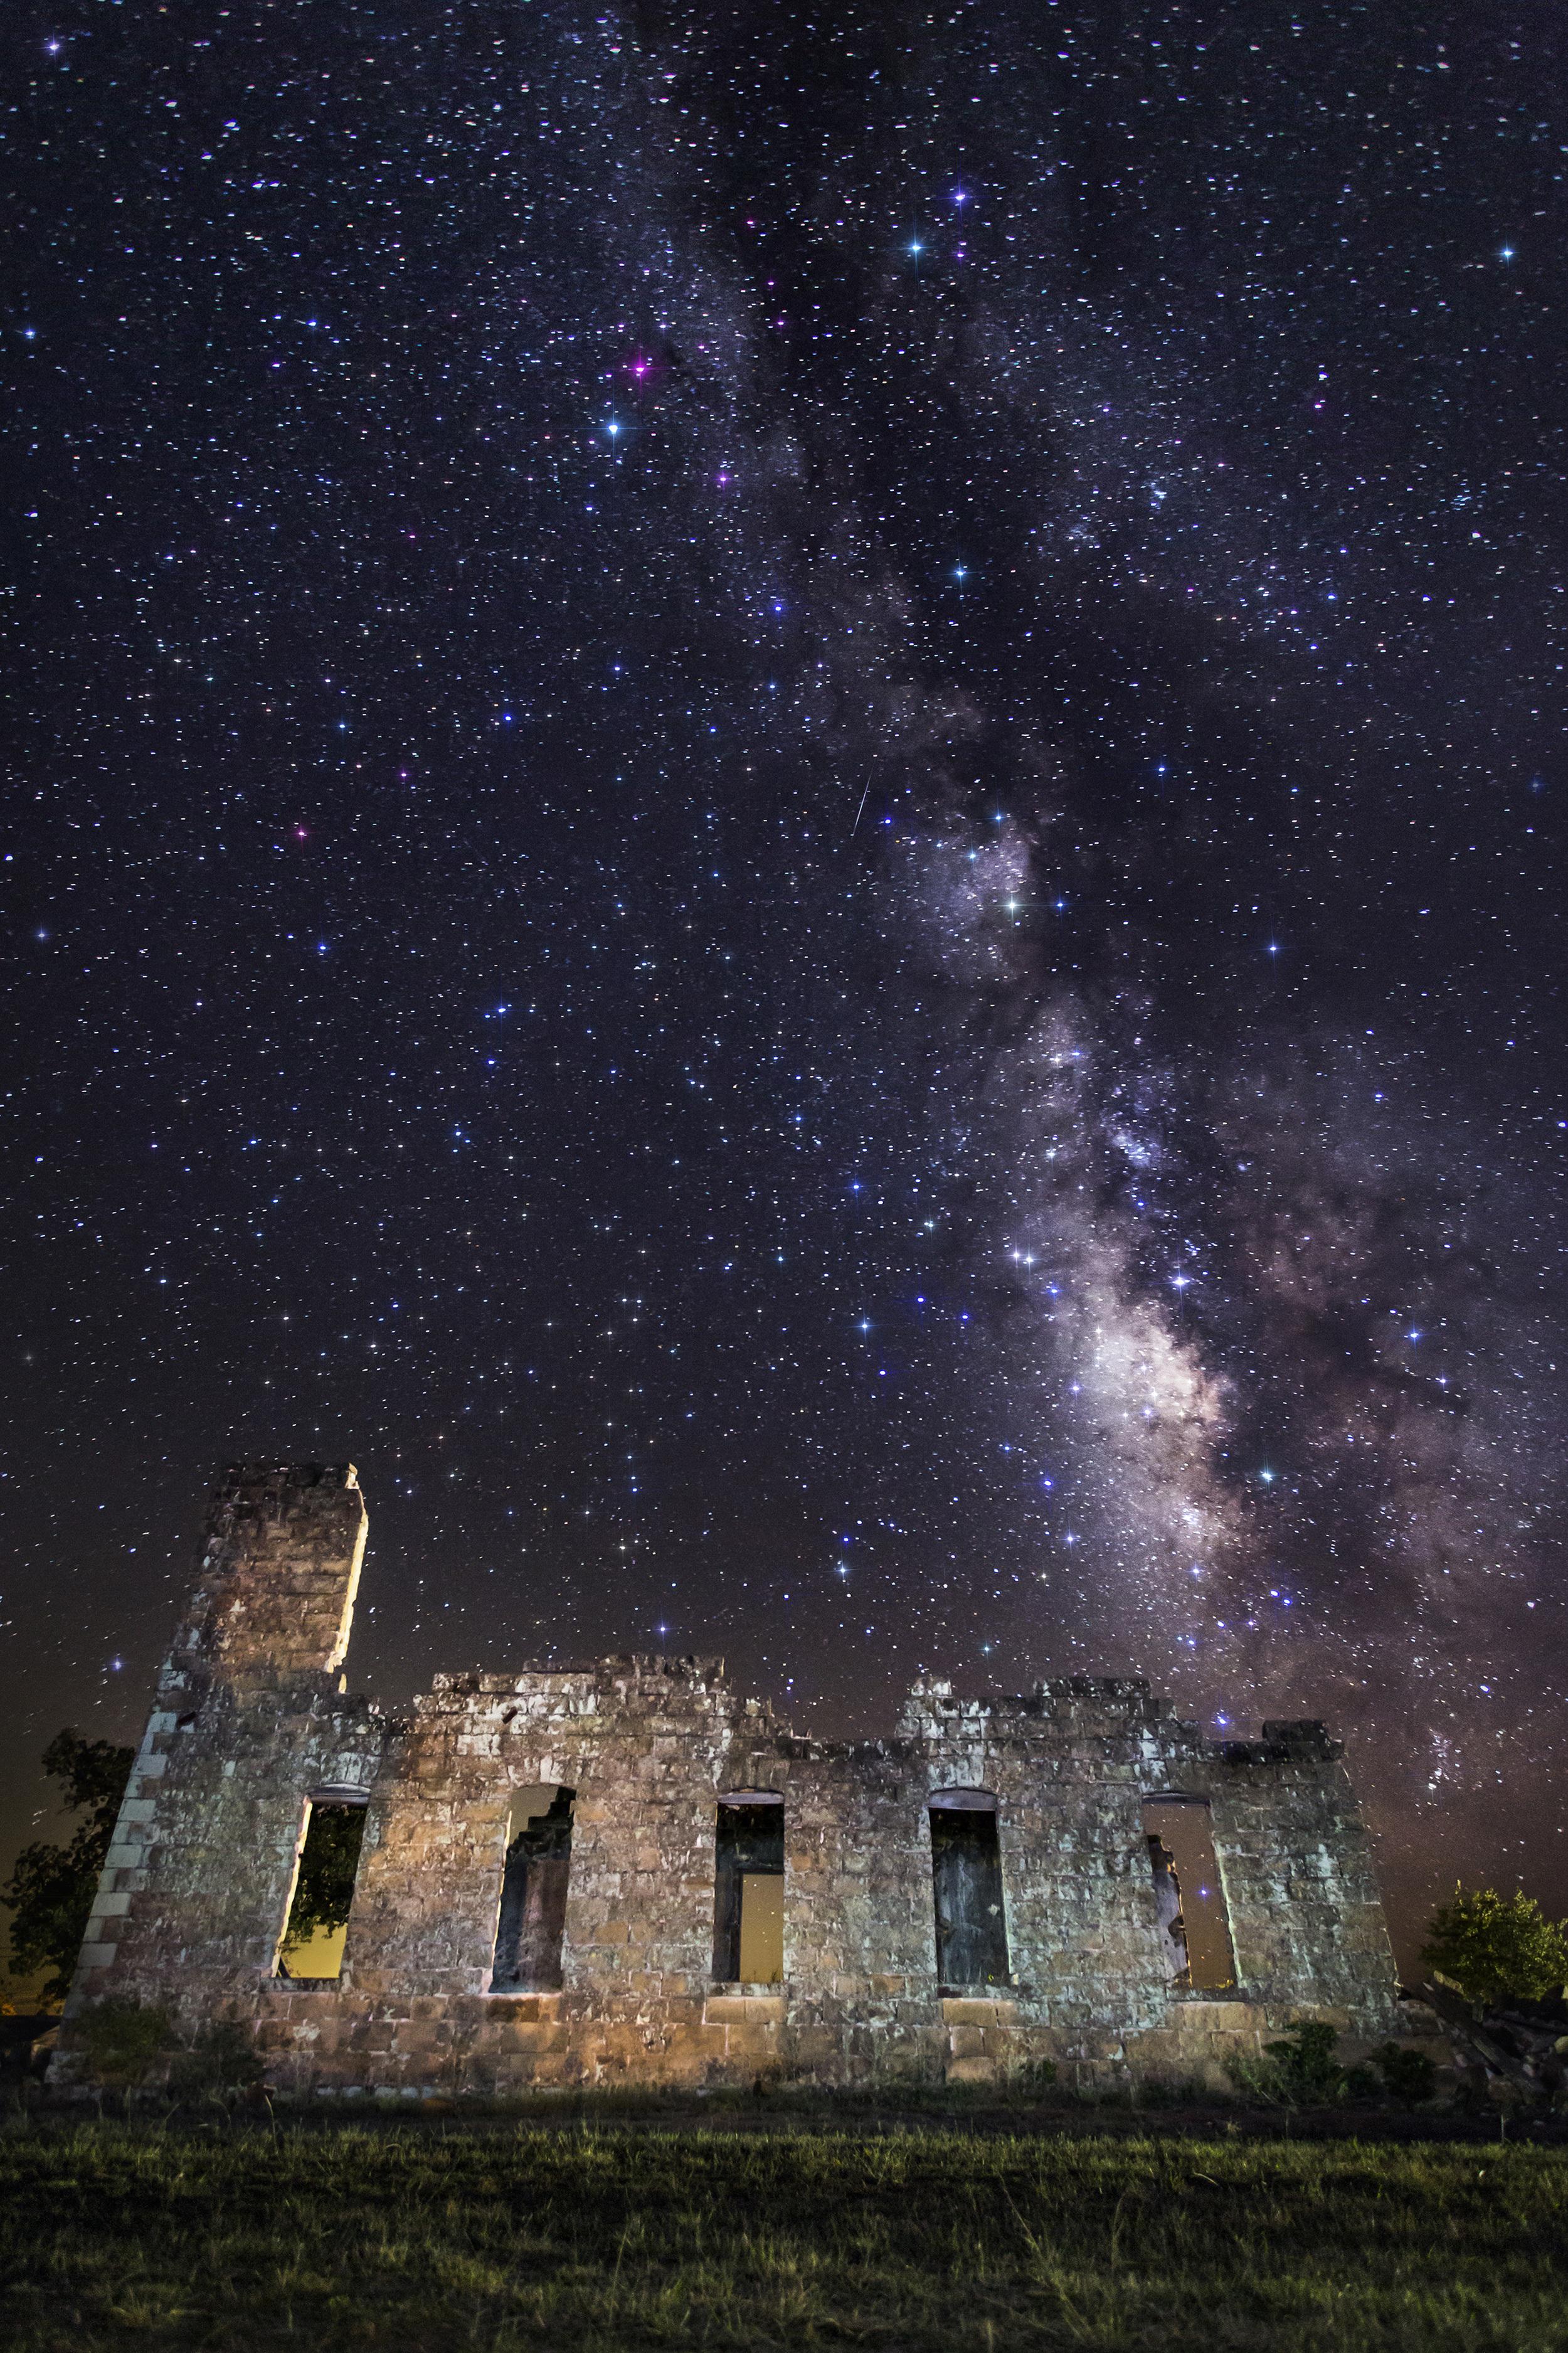 Milky Way over the San Fernando Academy ruins in Pontotoc, Texas.